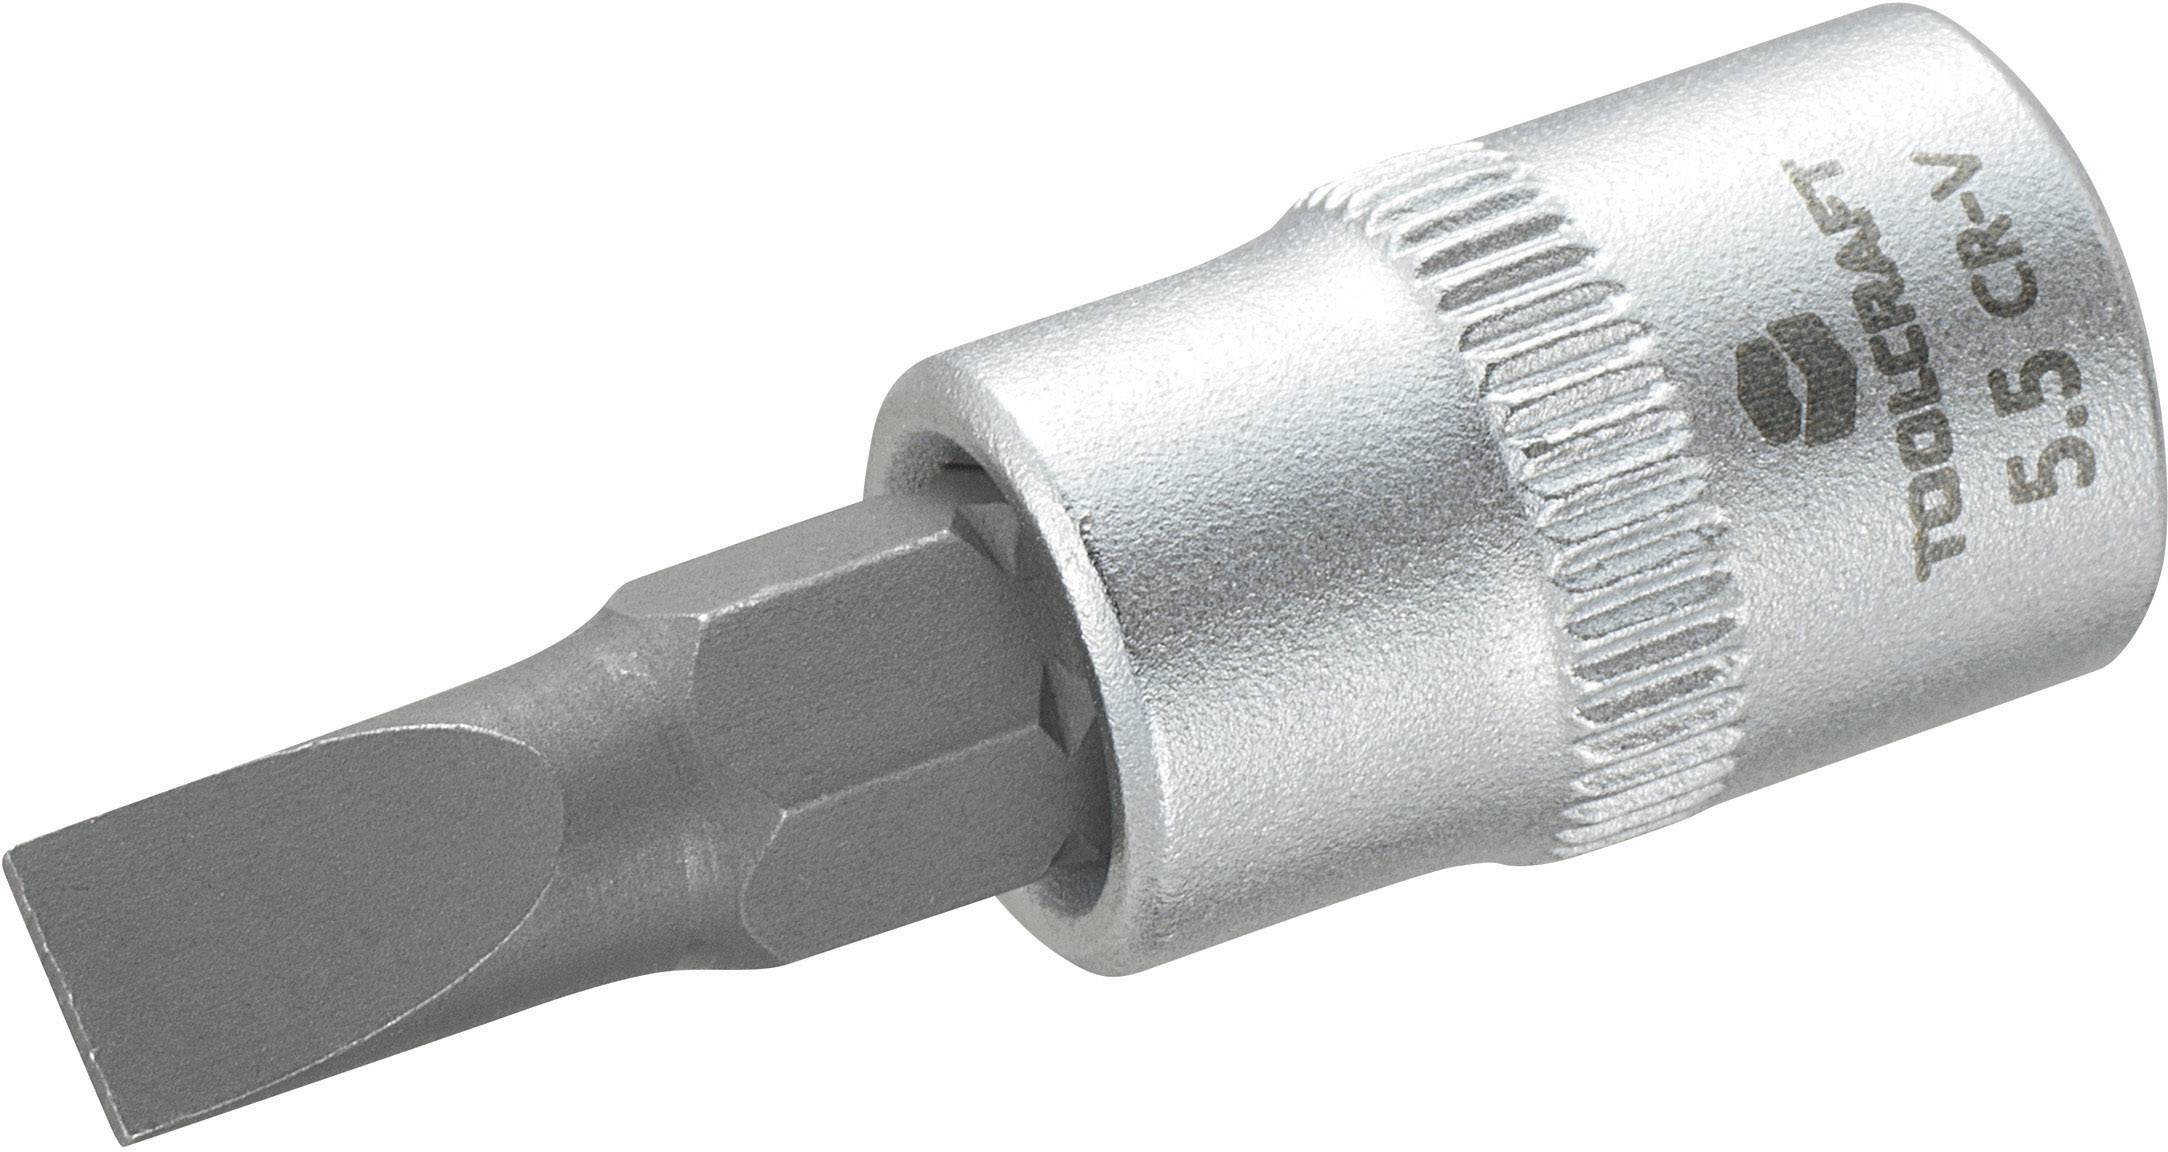 "Nástrčný kľúč, plochý TOOLCRAFT 816062, 1/4"" (6,3 mm), chróm-vanadiová oceľ"